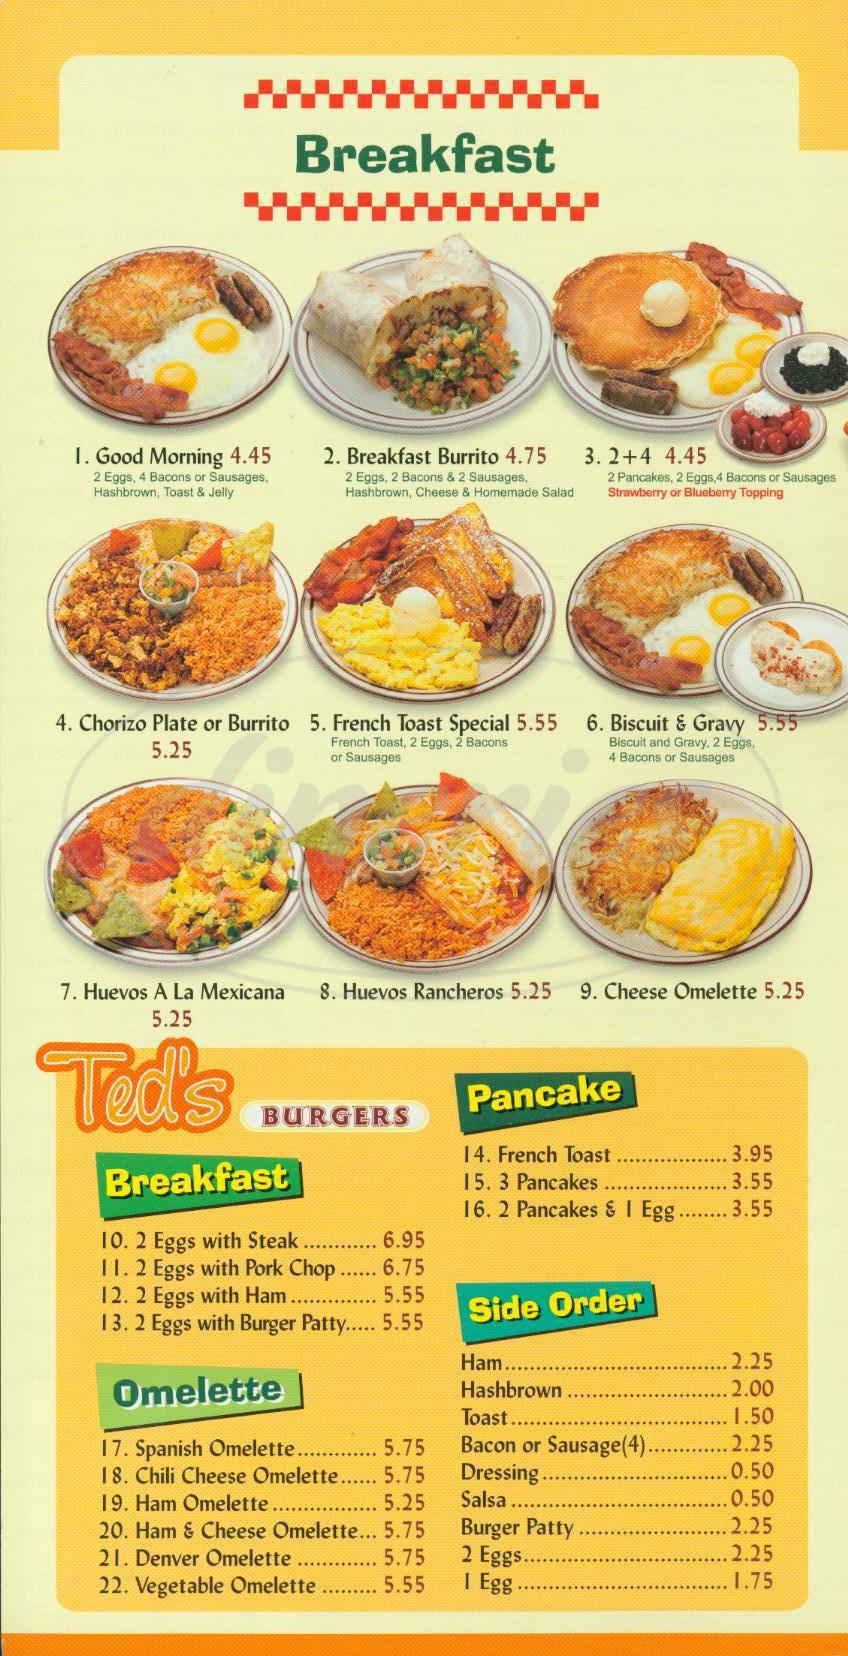 menu for Teds Burgers